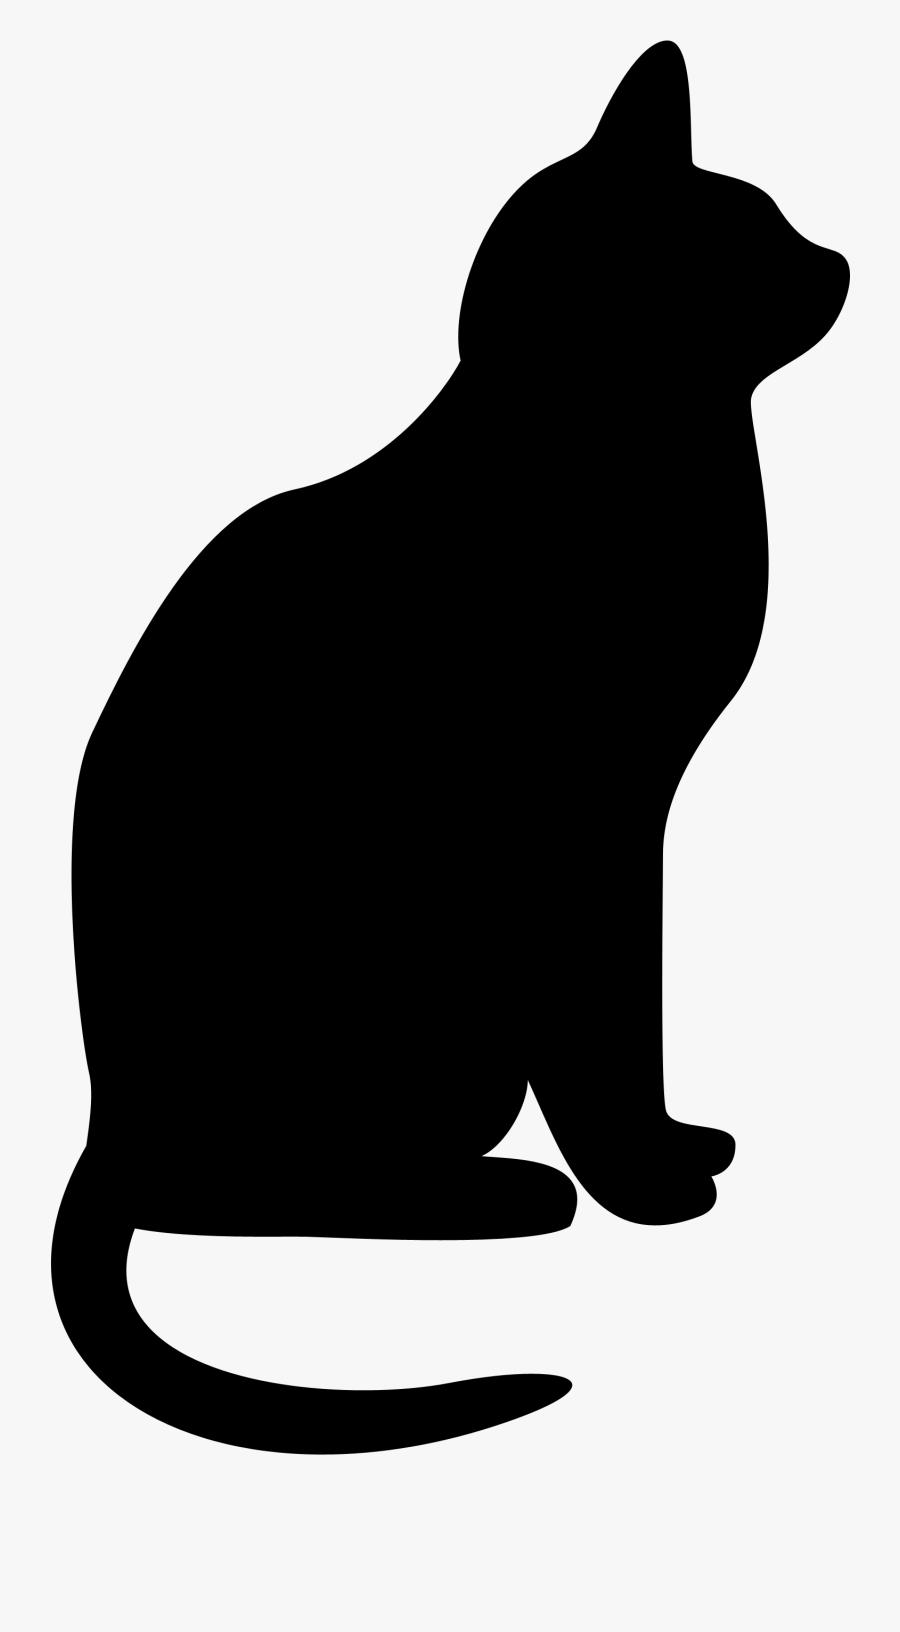 Black Cat Cats Clipart Silhouette Clip Art Transparent - Silhouette Black Cat Clipart, Transparent Clipart